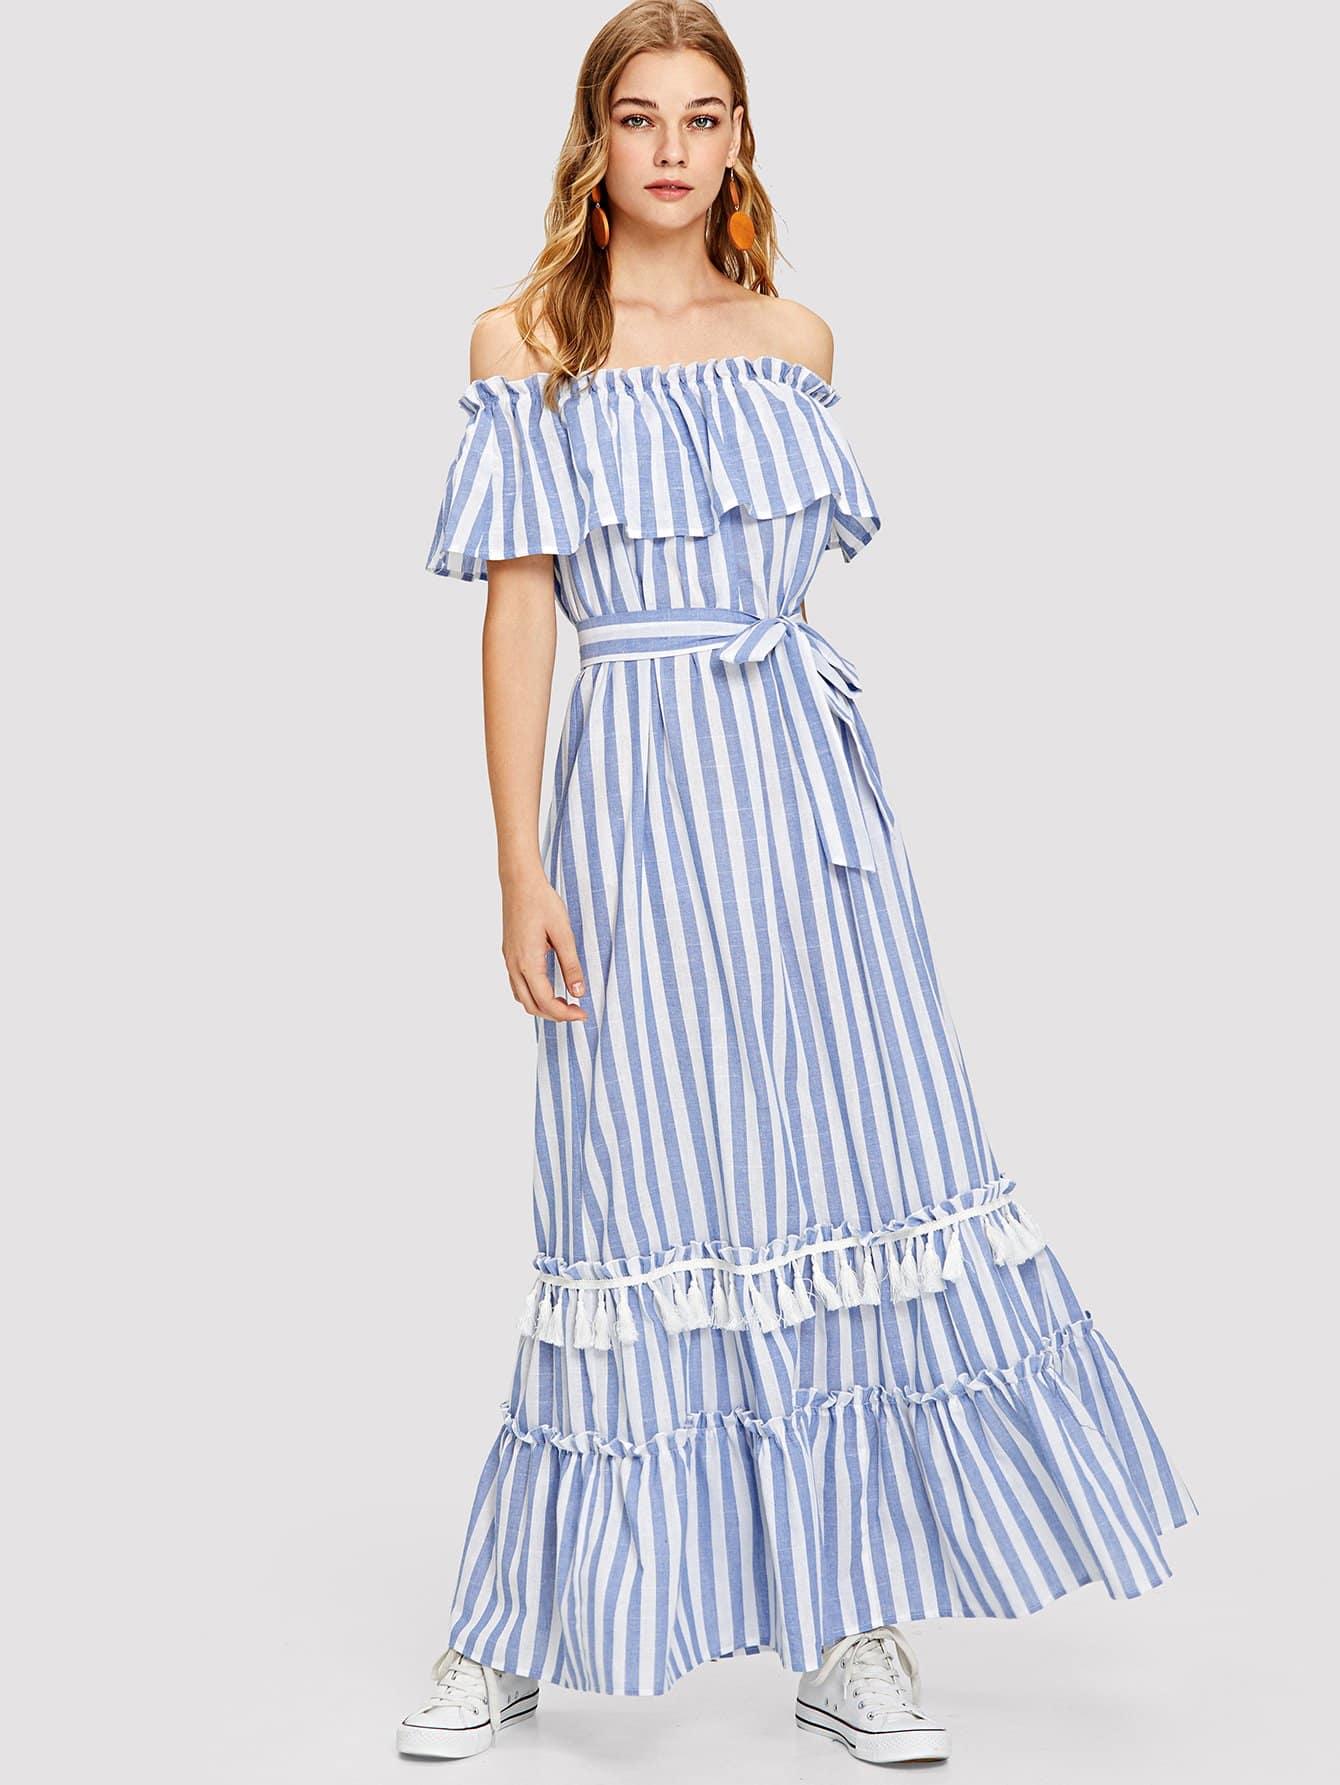 Tassel Detail Self Belted Layered Hem Striped Foldover Dress tassel detail striped swimsuit